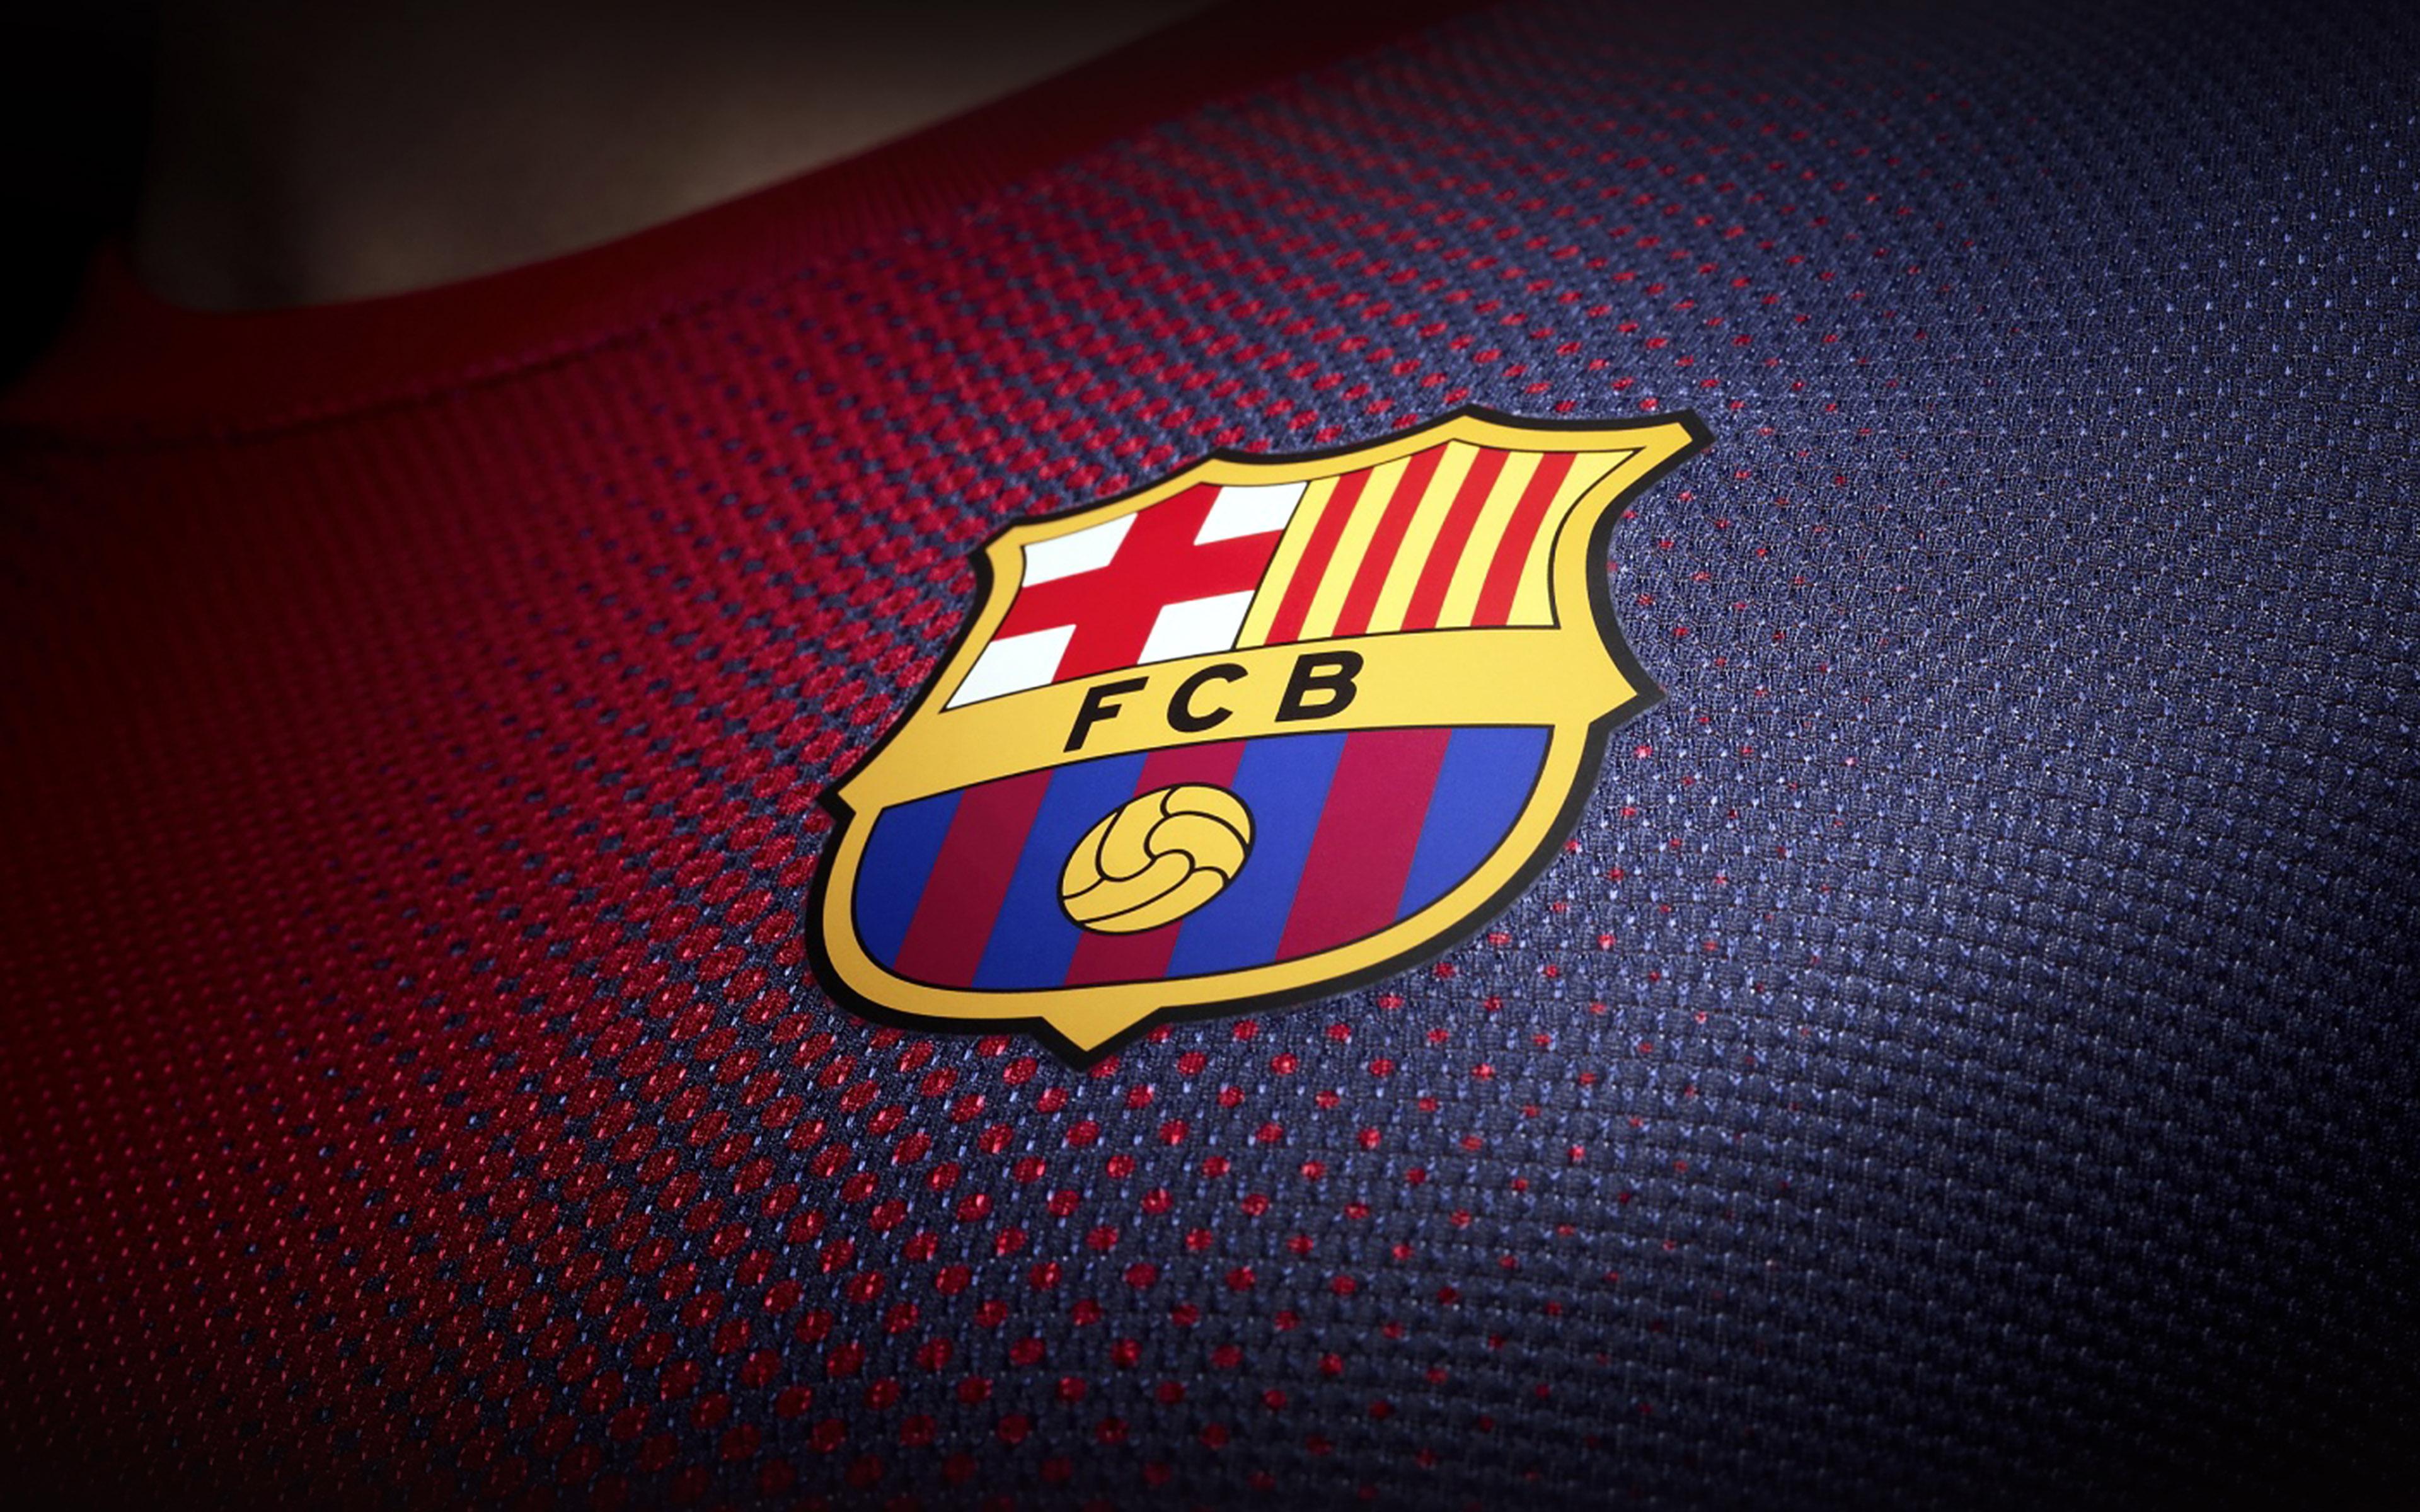 Desktoppapers Co Ac37 Wallpaper Barcelona Logo Emblem Sports